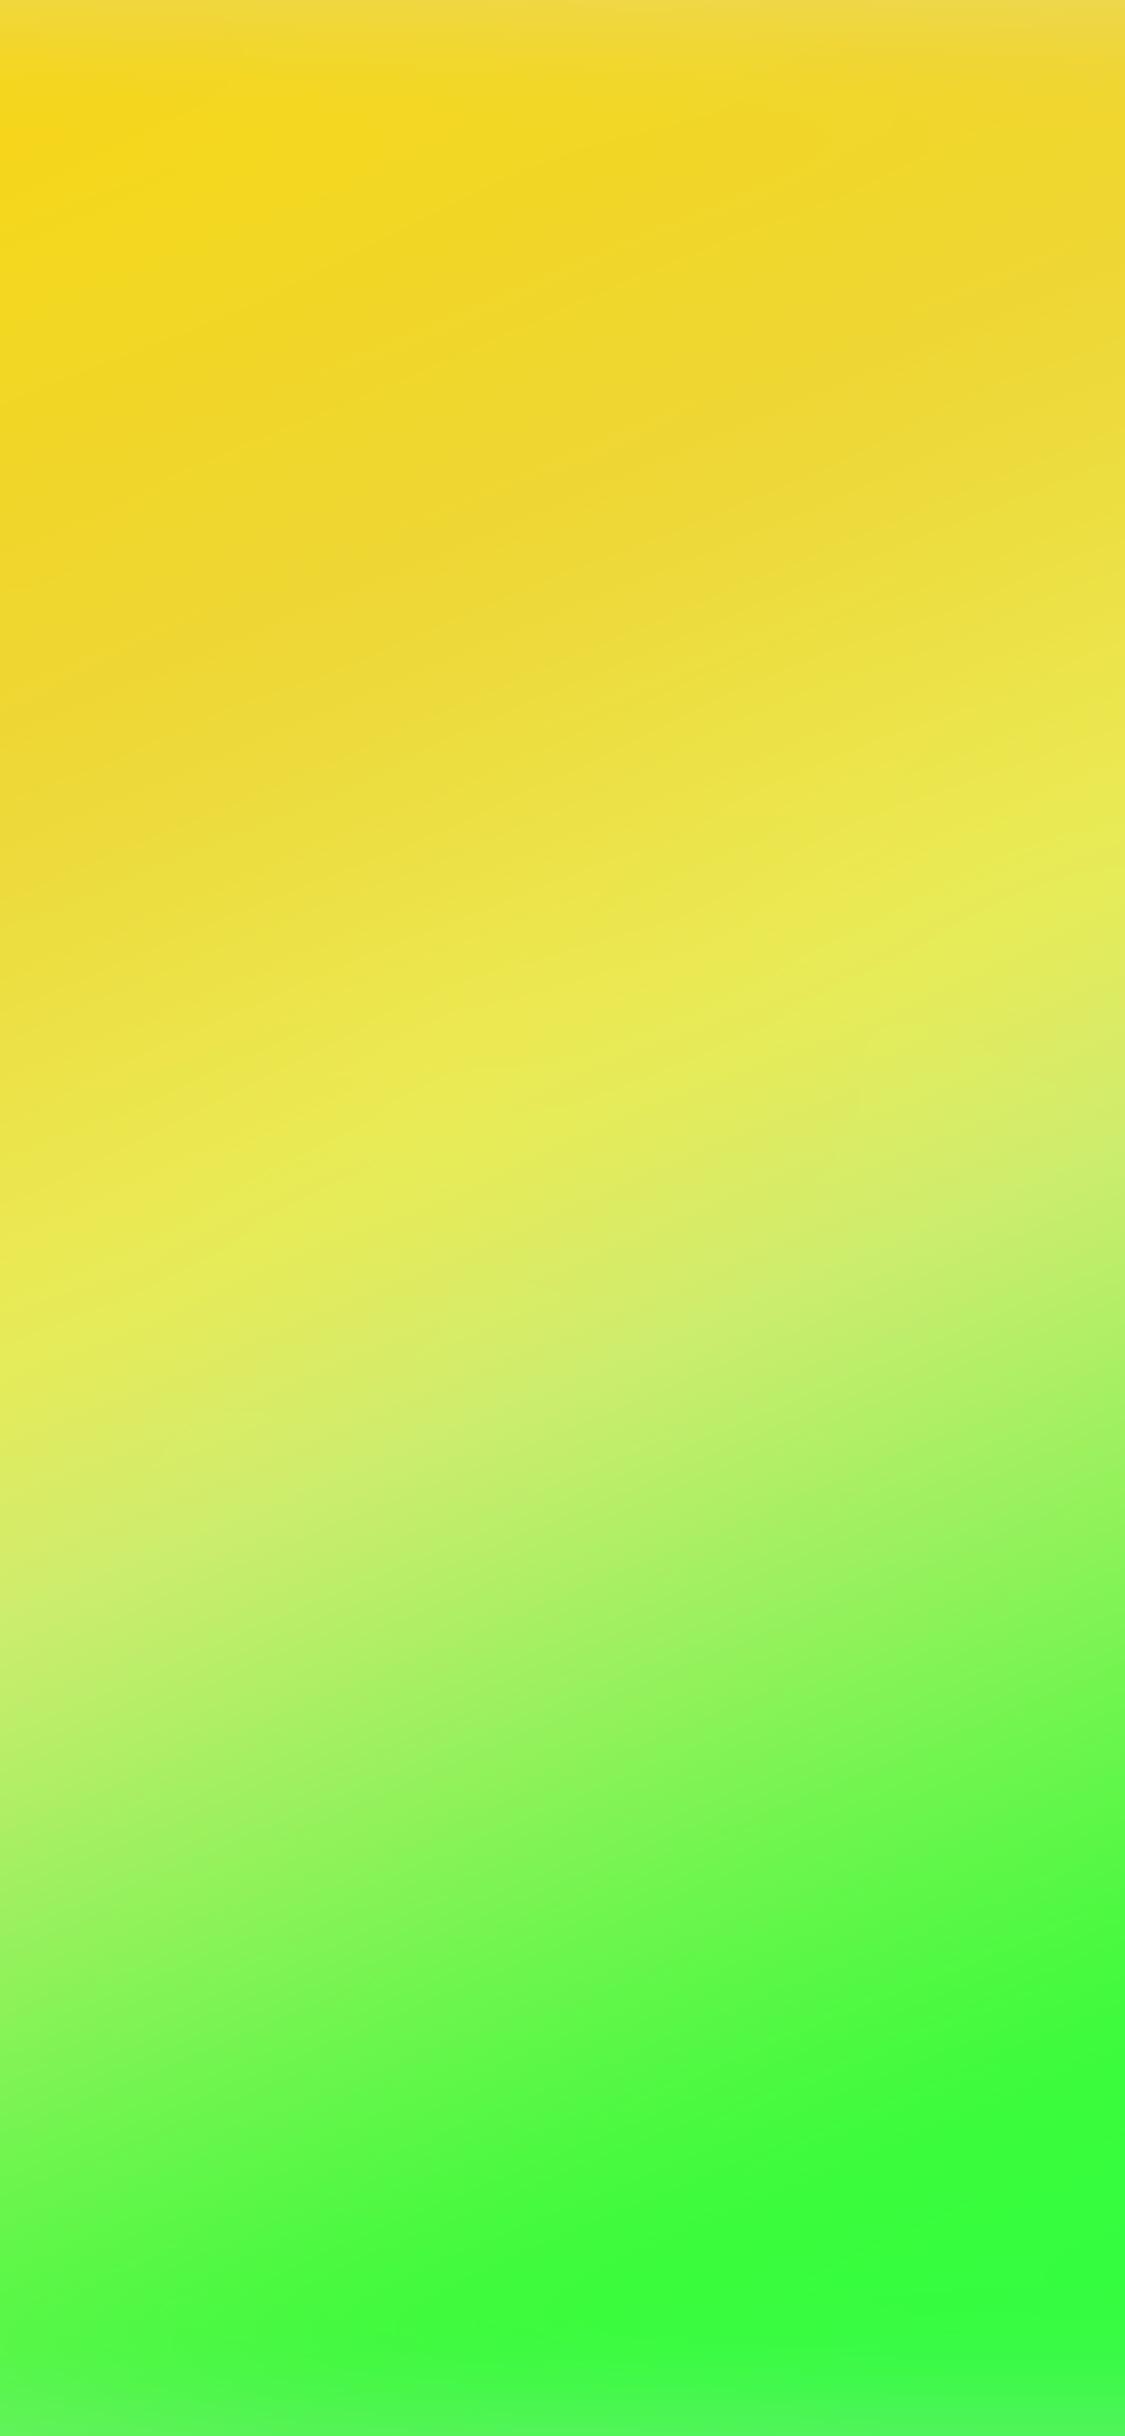 Sl79 Yellow Green Blur Gradation